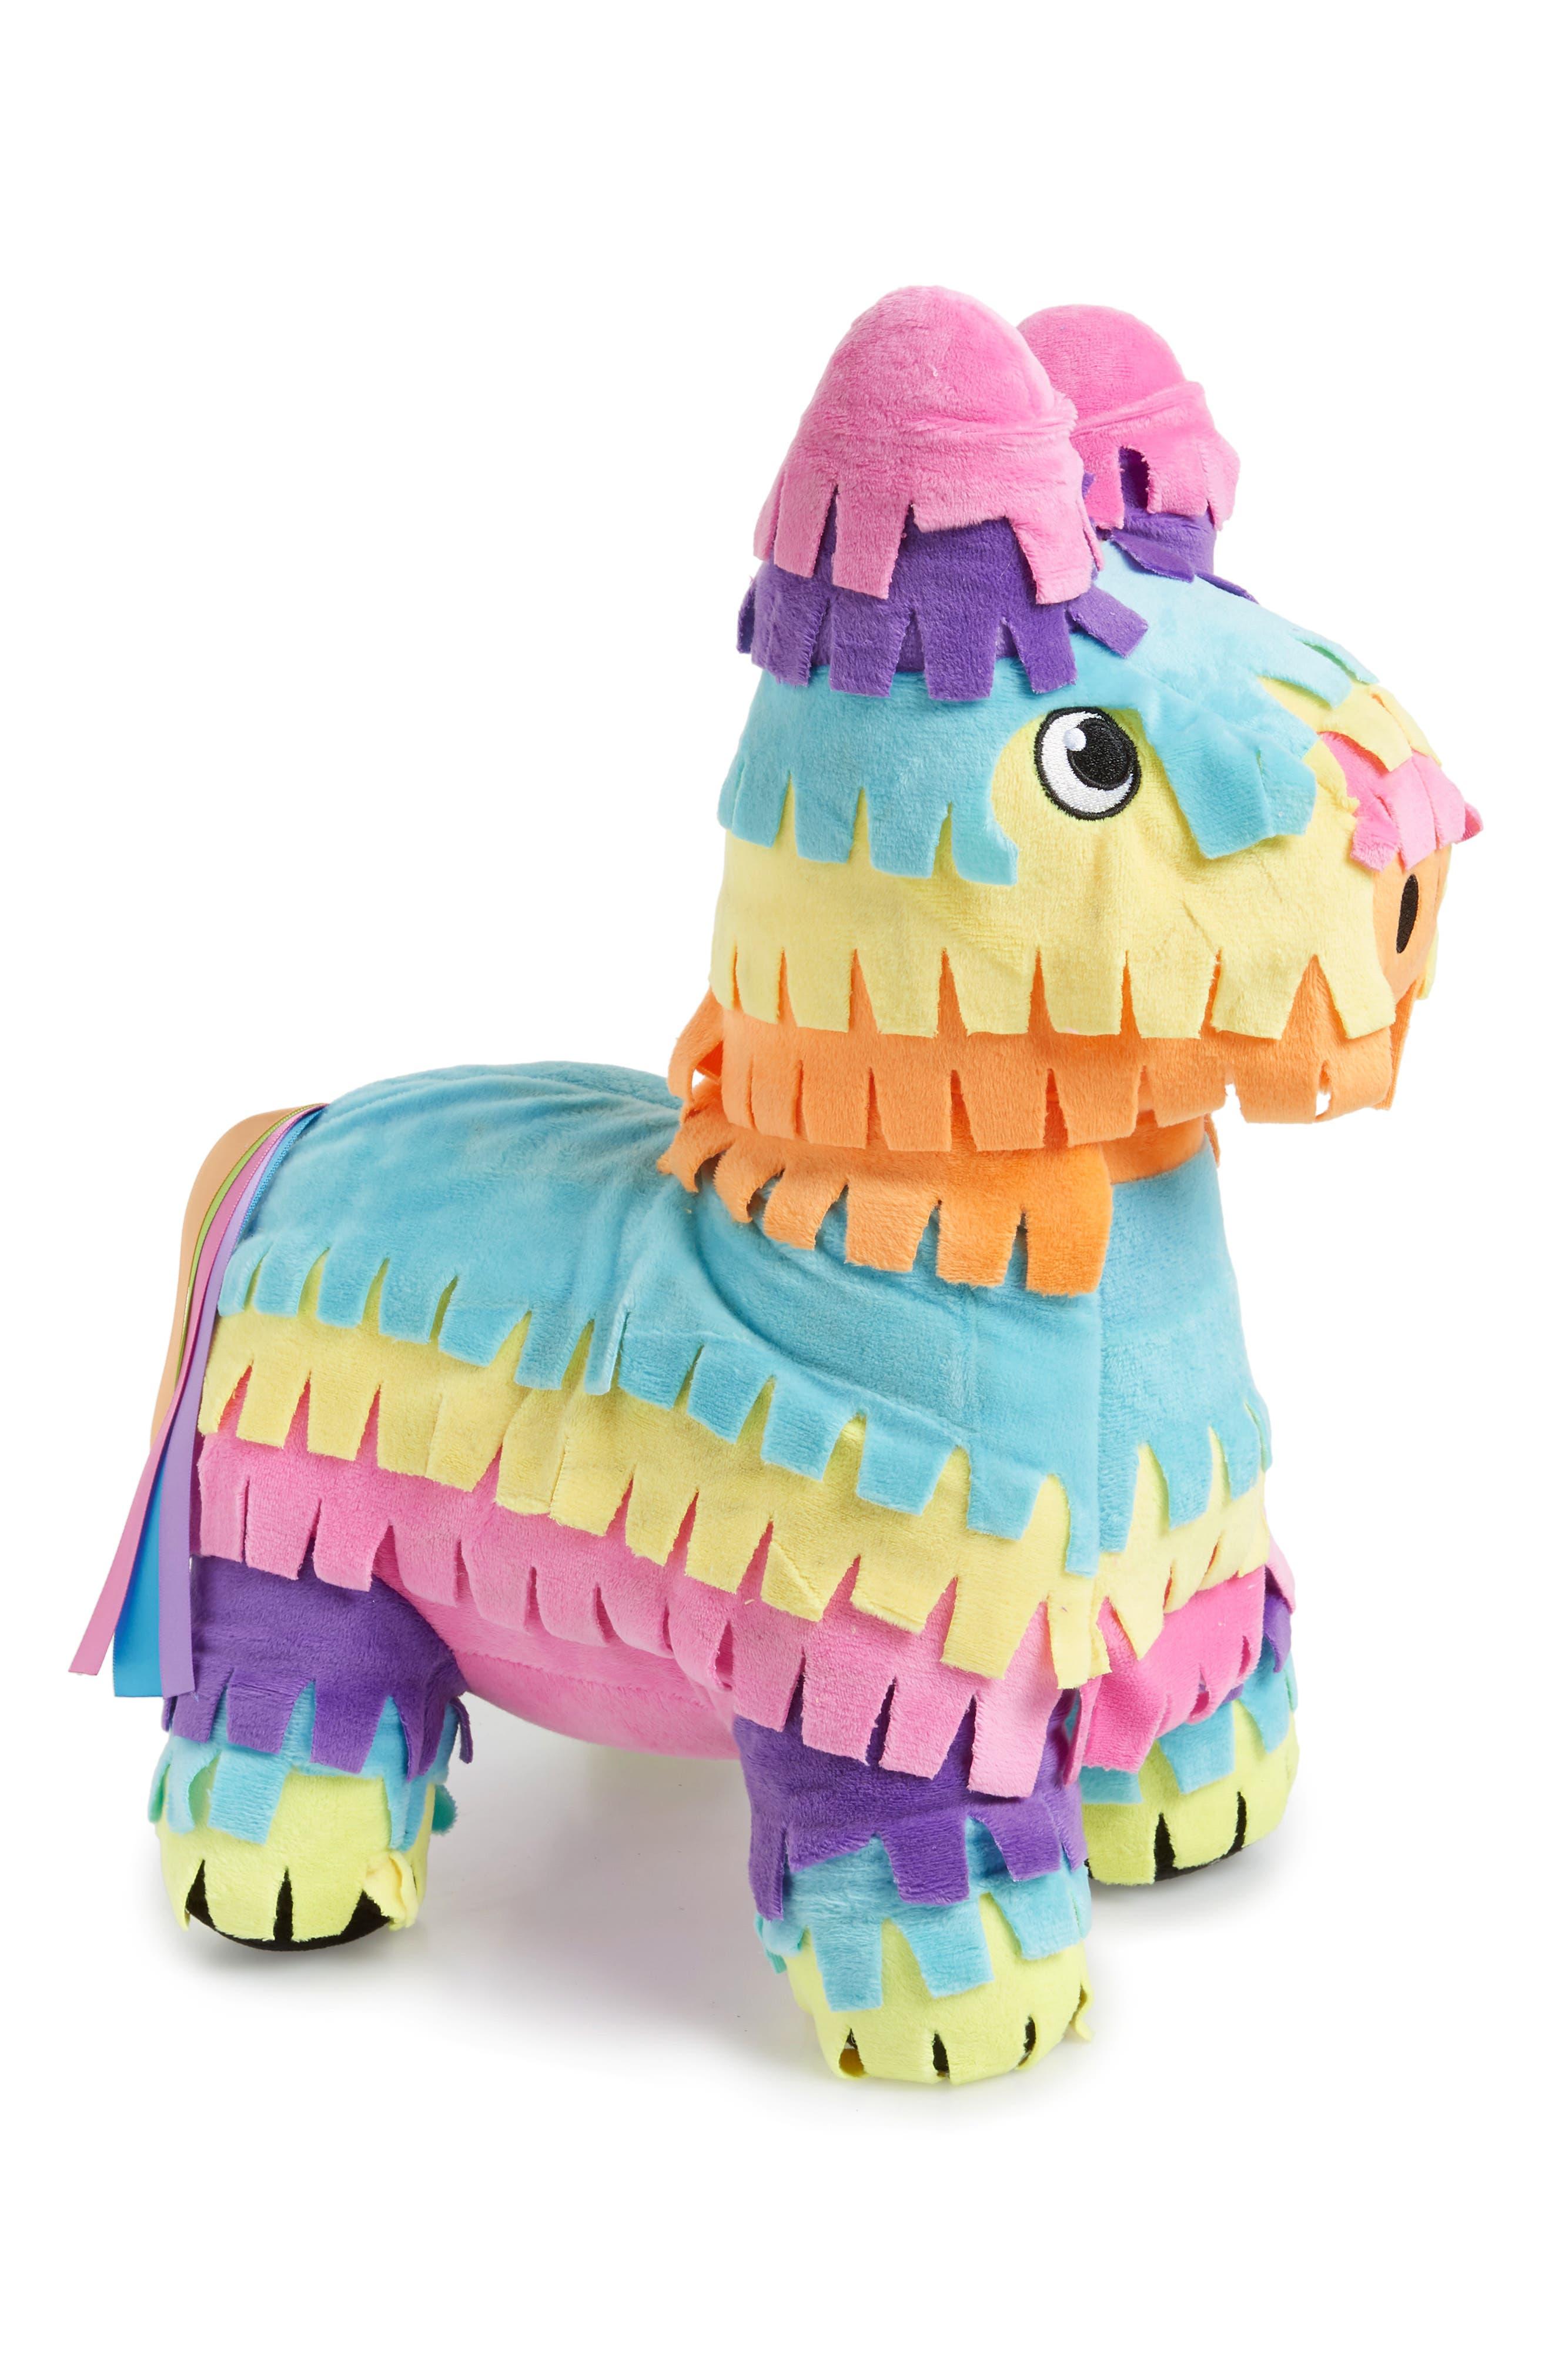 Piñata Pillow,                             Main thumbnail 1, color,                             400